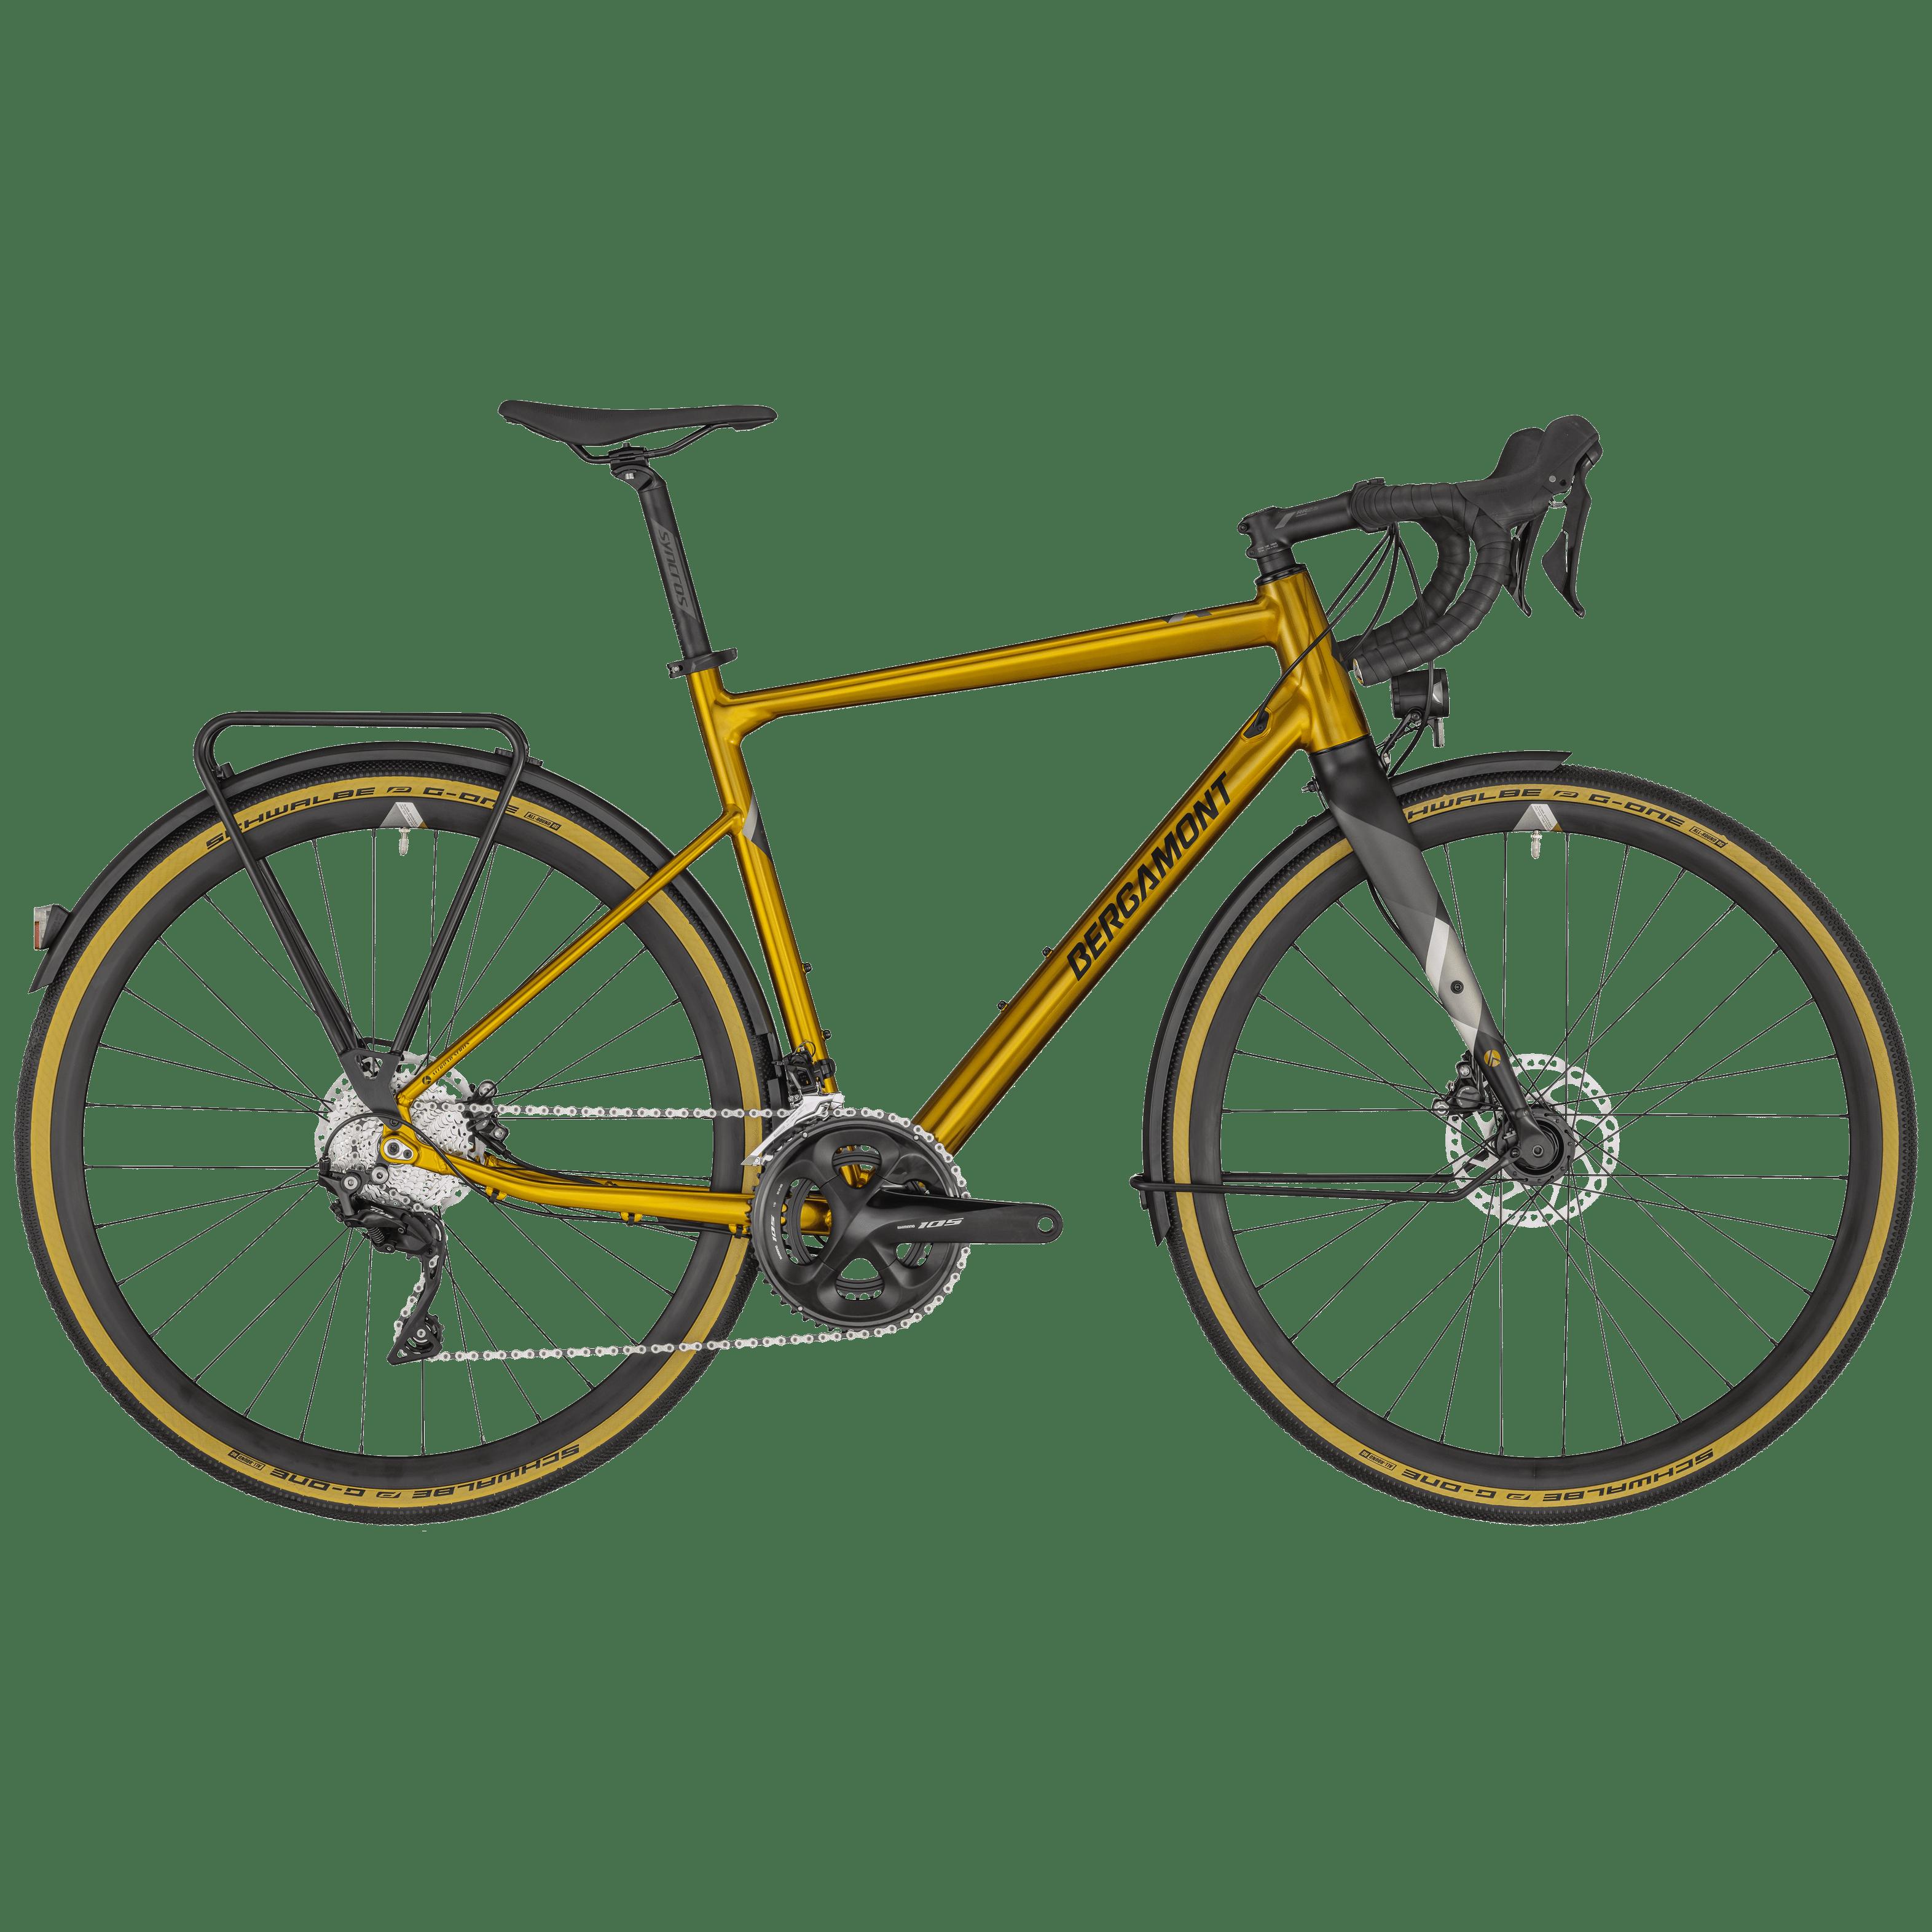 Esprit vélo bergamont Grandurance RD7